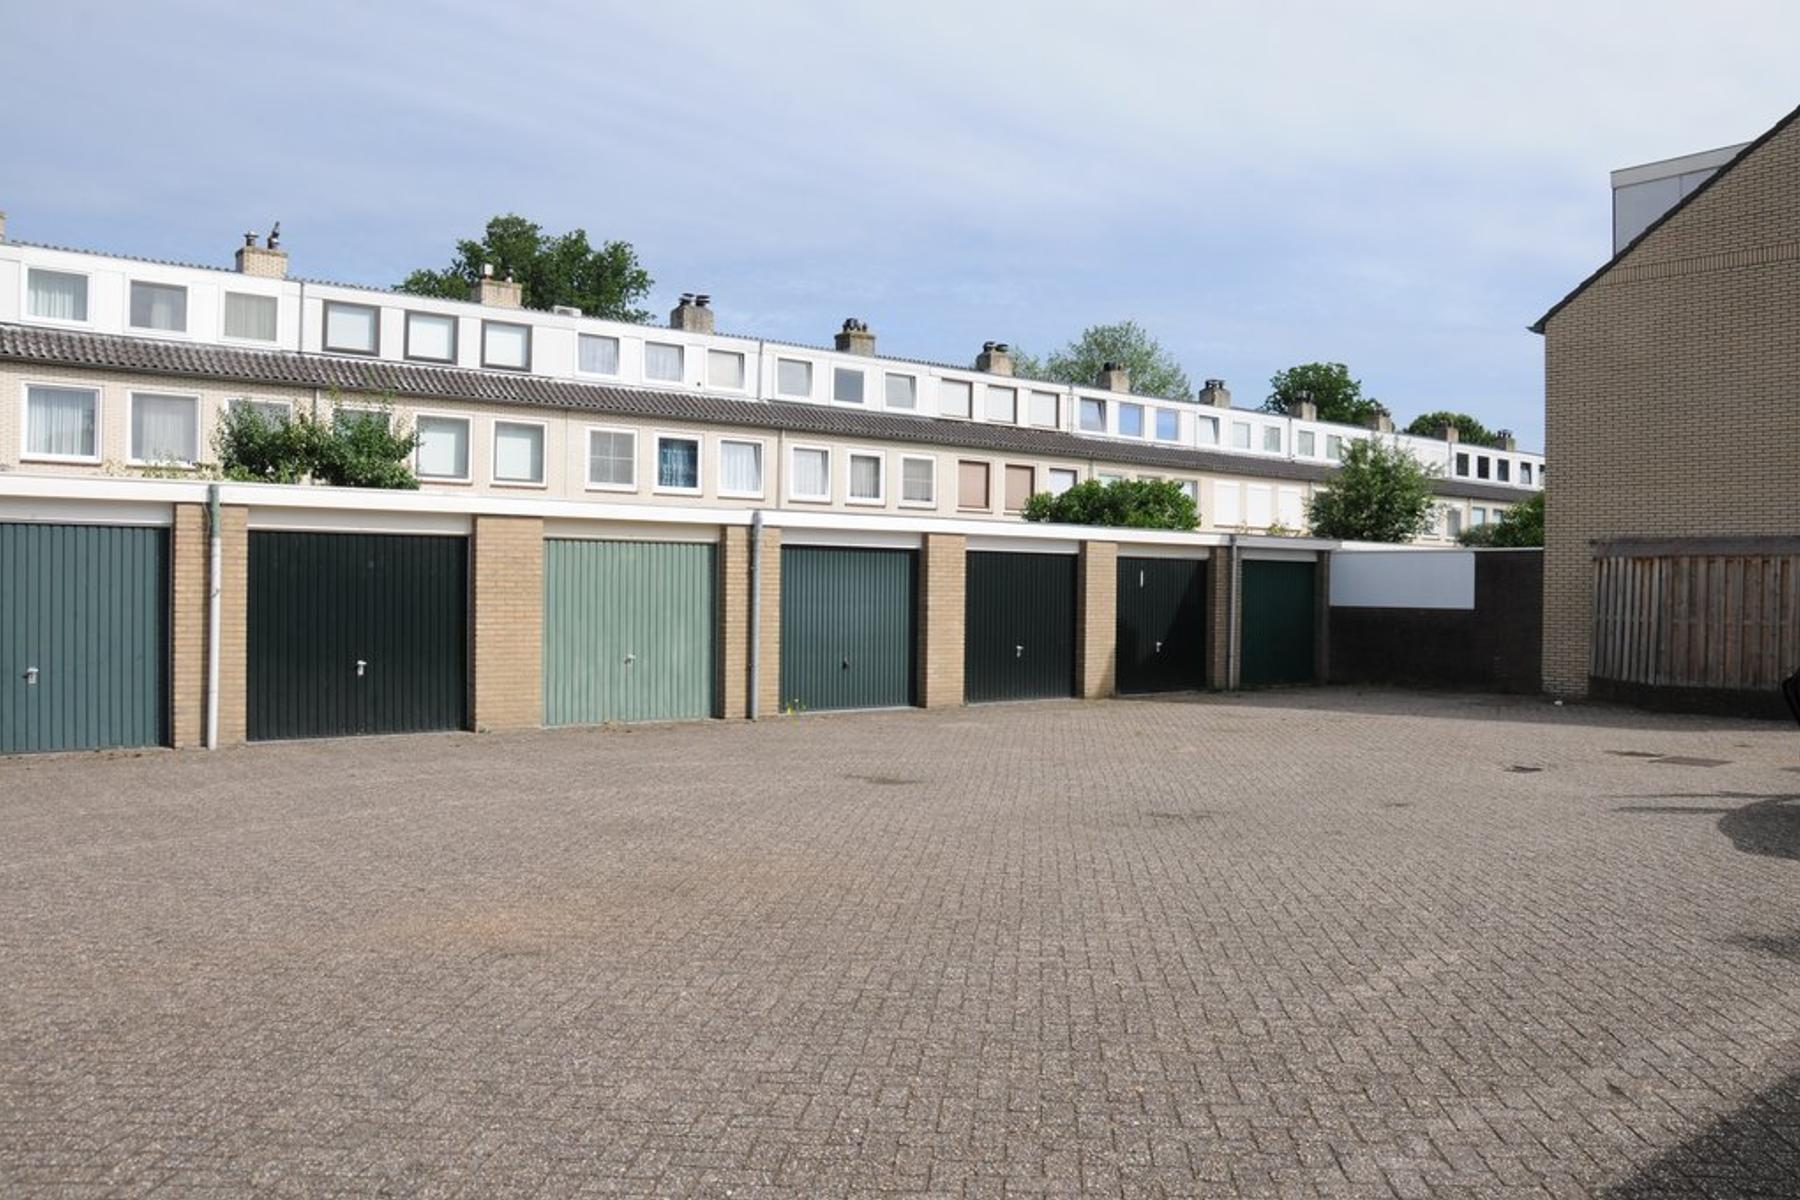 Damhertlaan 25 in Driebergen-Rijsenburg 3972 DA